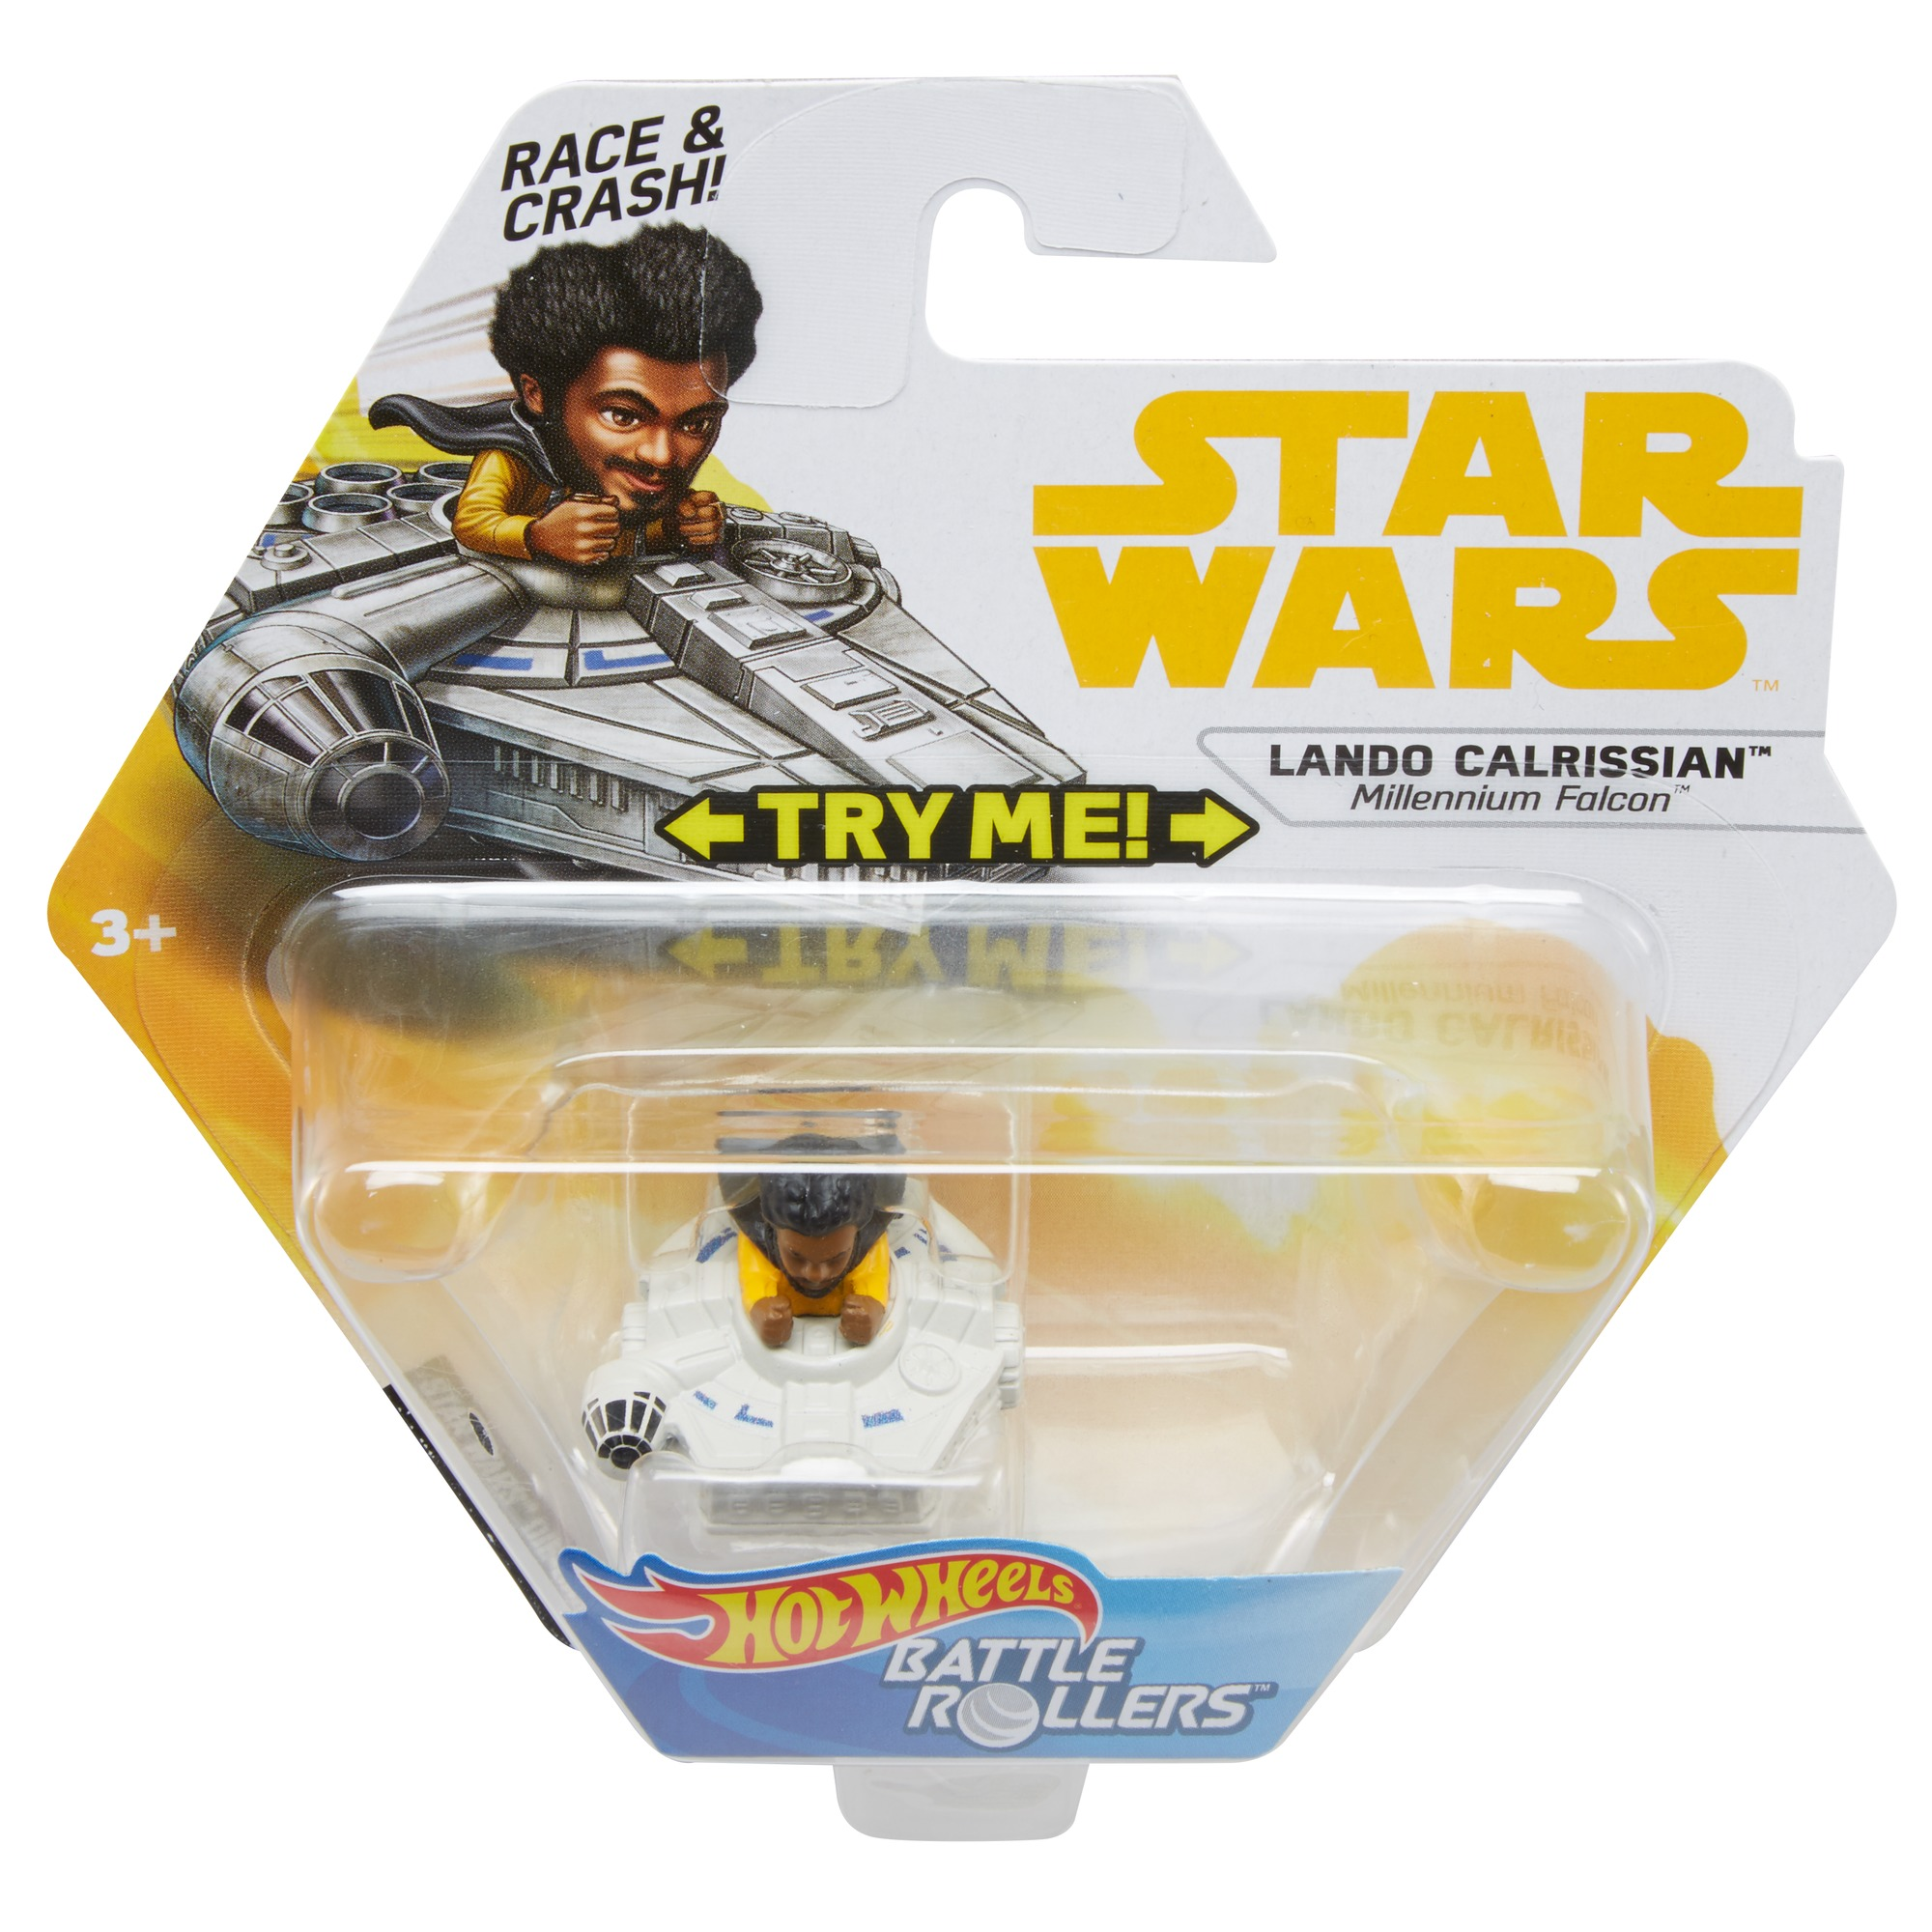 Solo: ASWS HW Lando Calrissian Battle Roller Toy 1